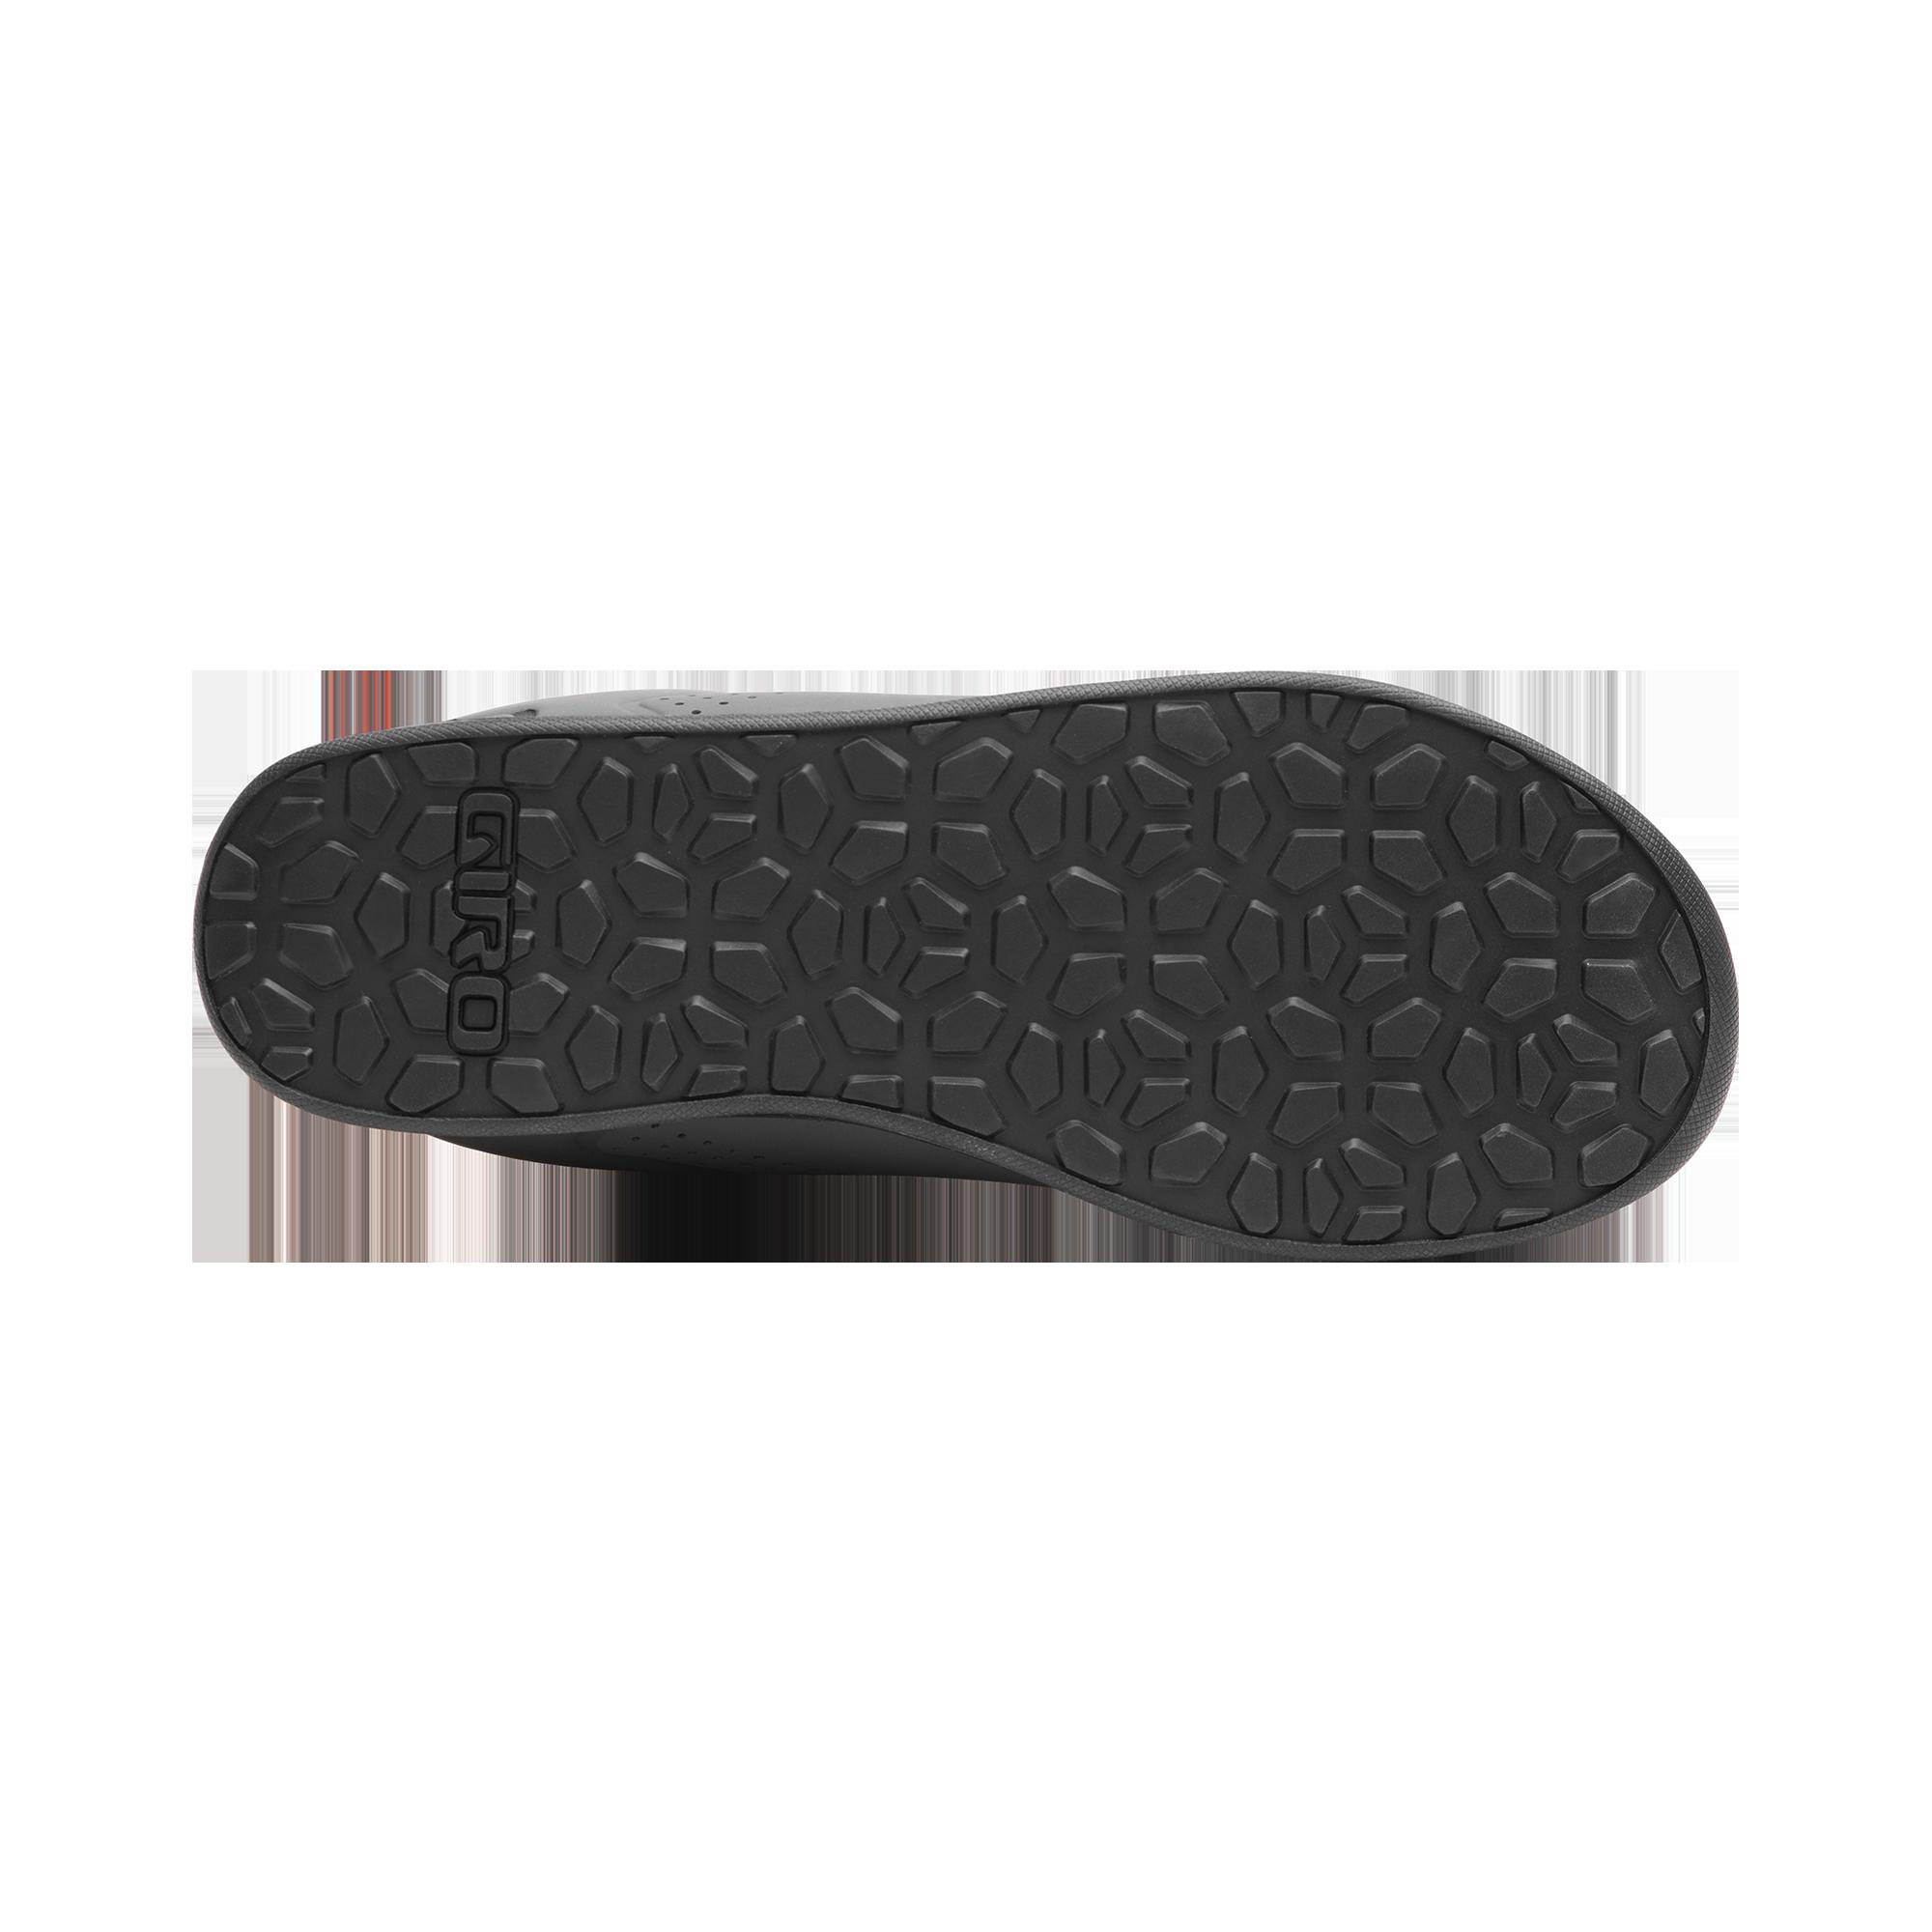 Heisse Sohle:   Neuer MTB-Schuh Giro Latch